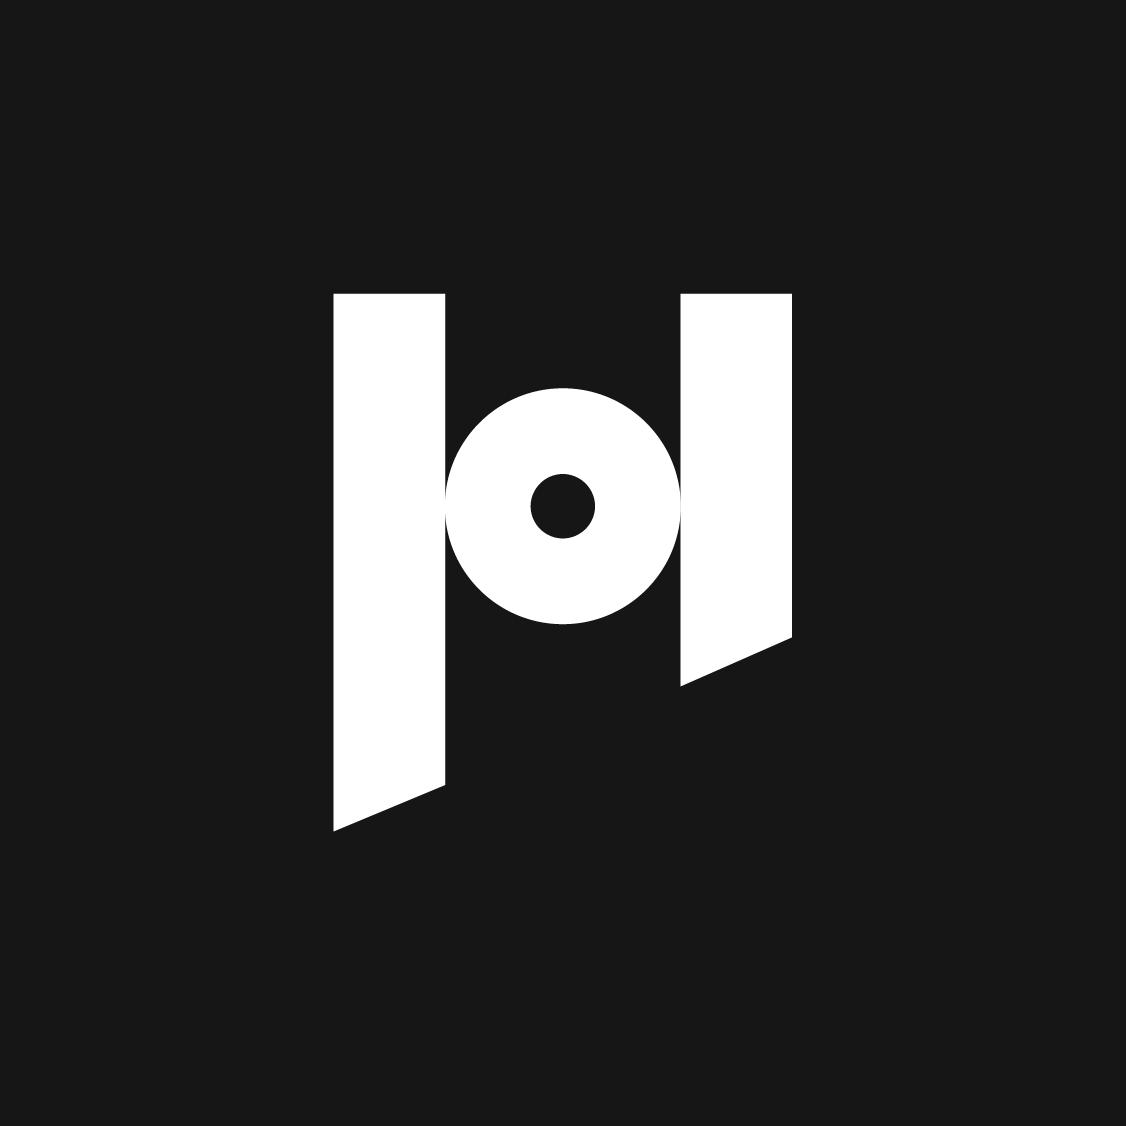 all-logos-2020-65